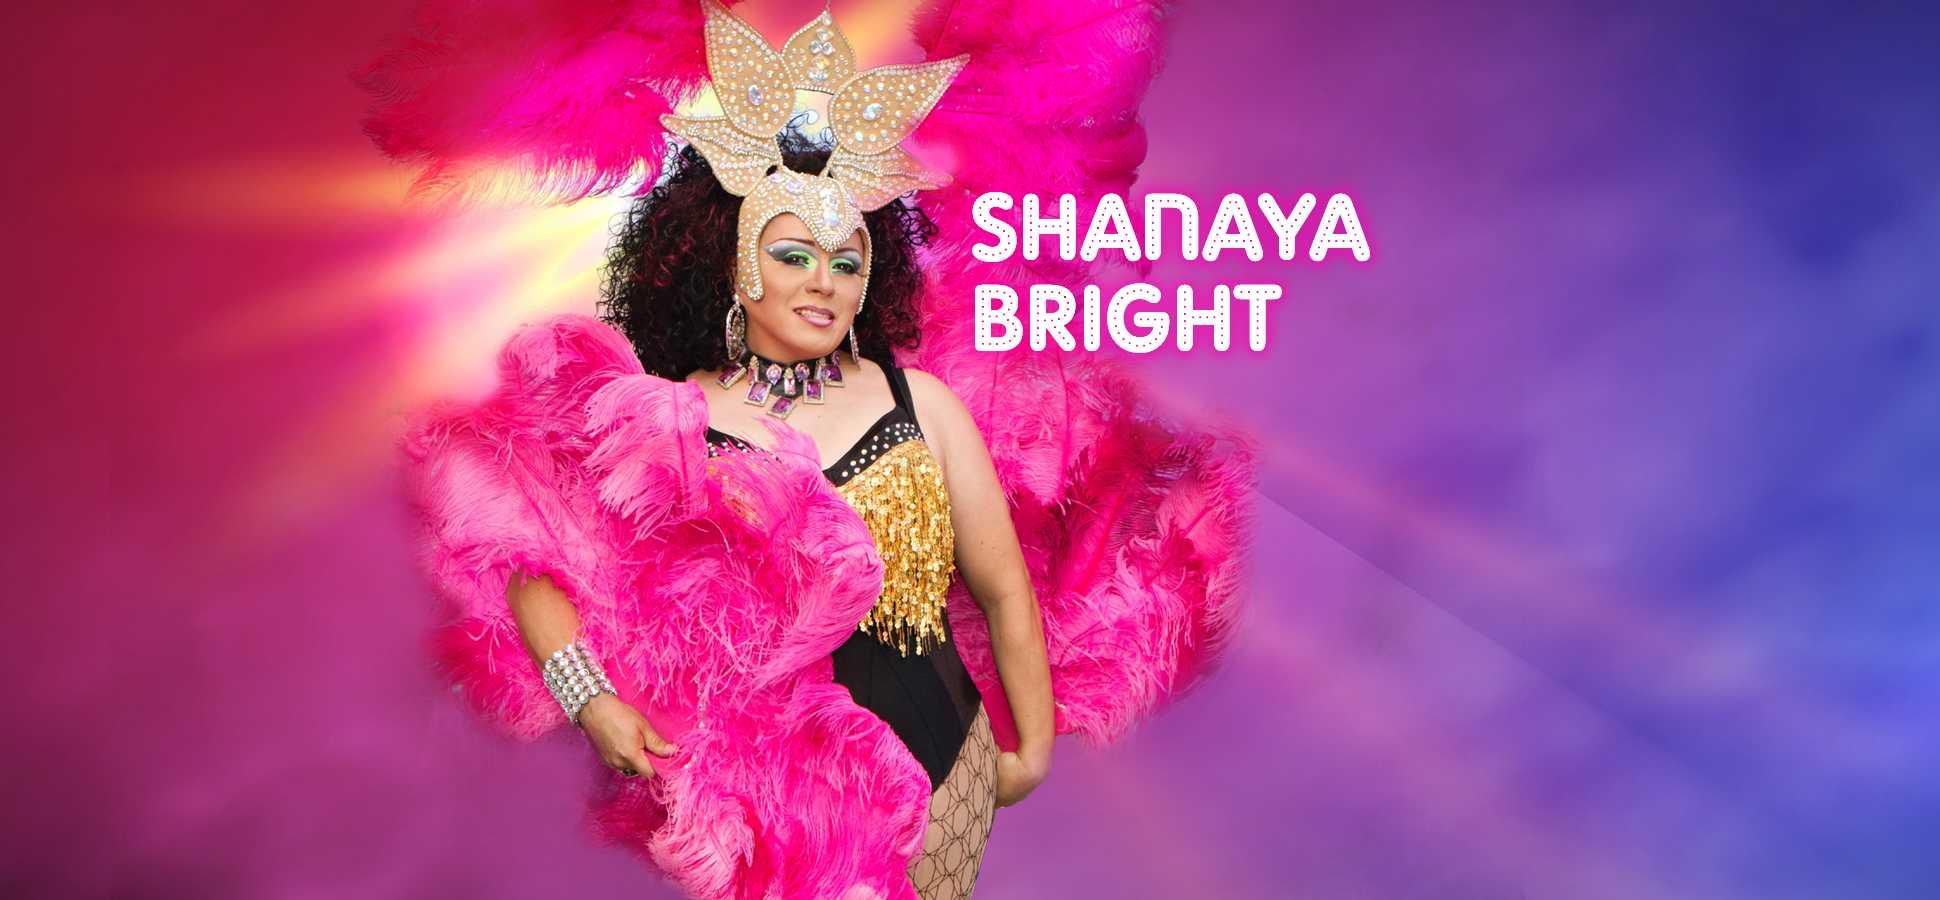 Shanyah Bright